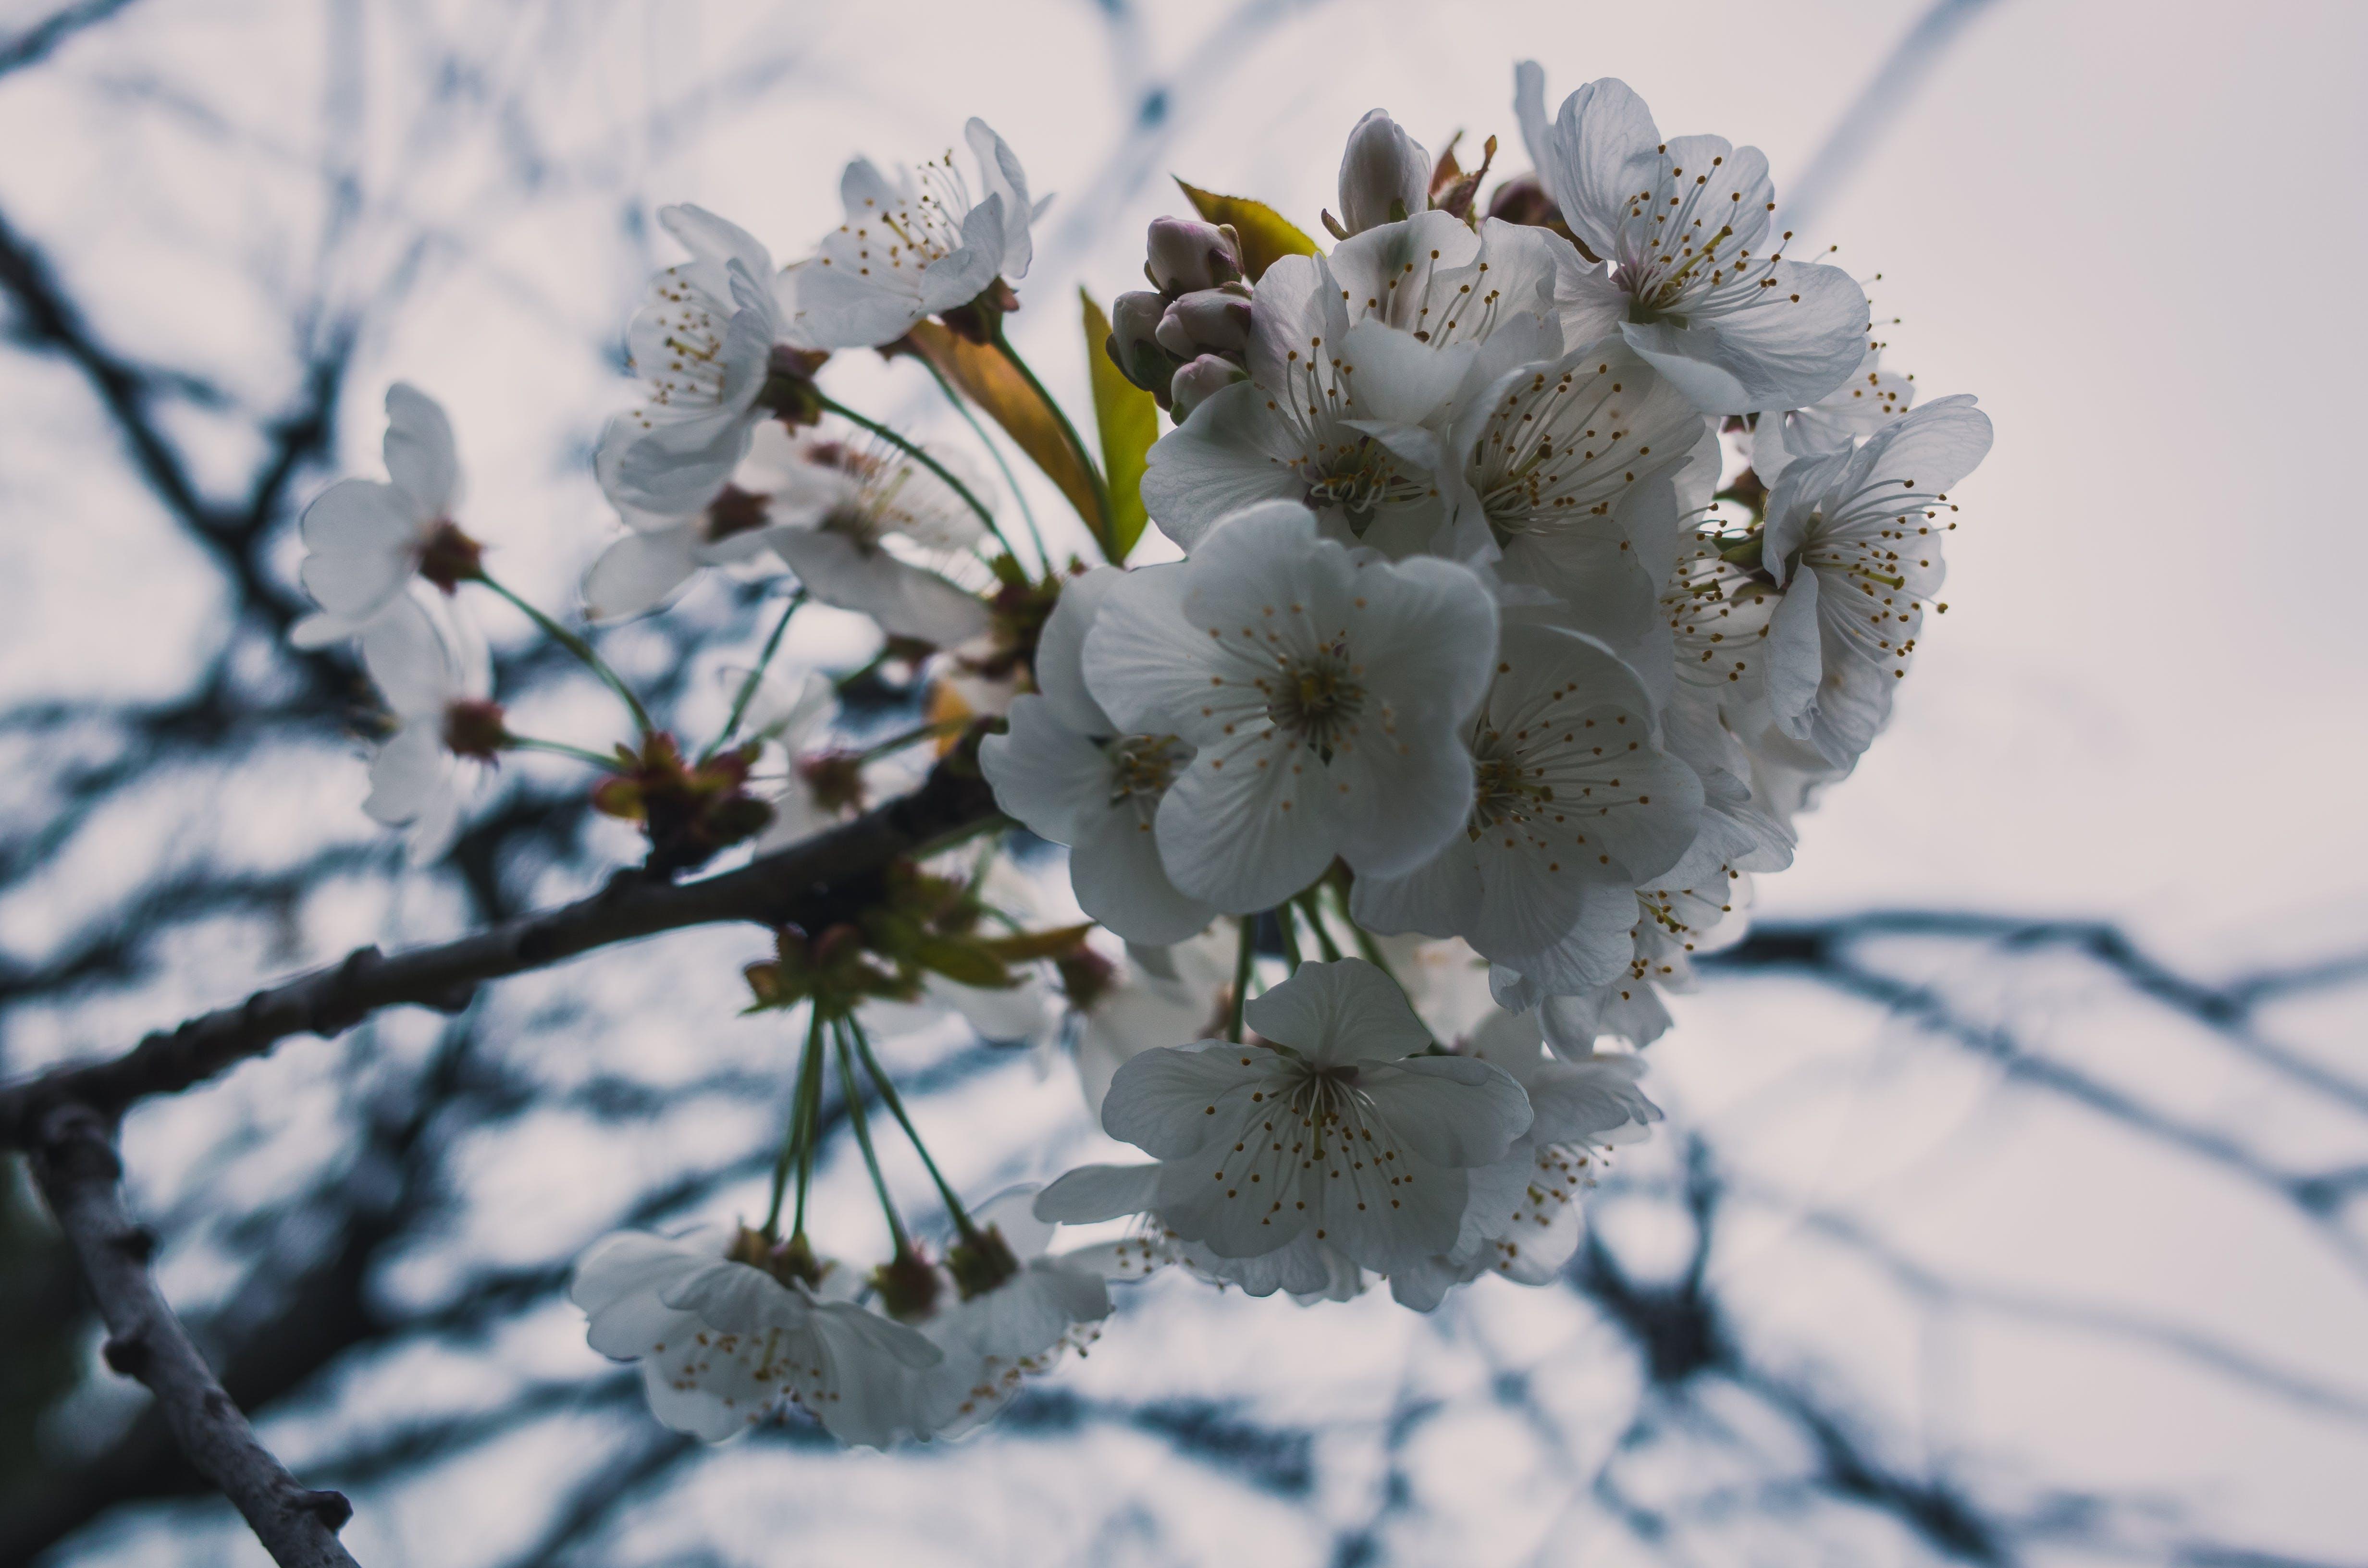 Free stock photo of bloom, blossom, cherry blossom, daylight